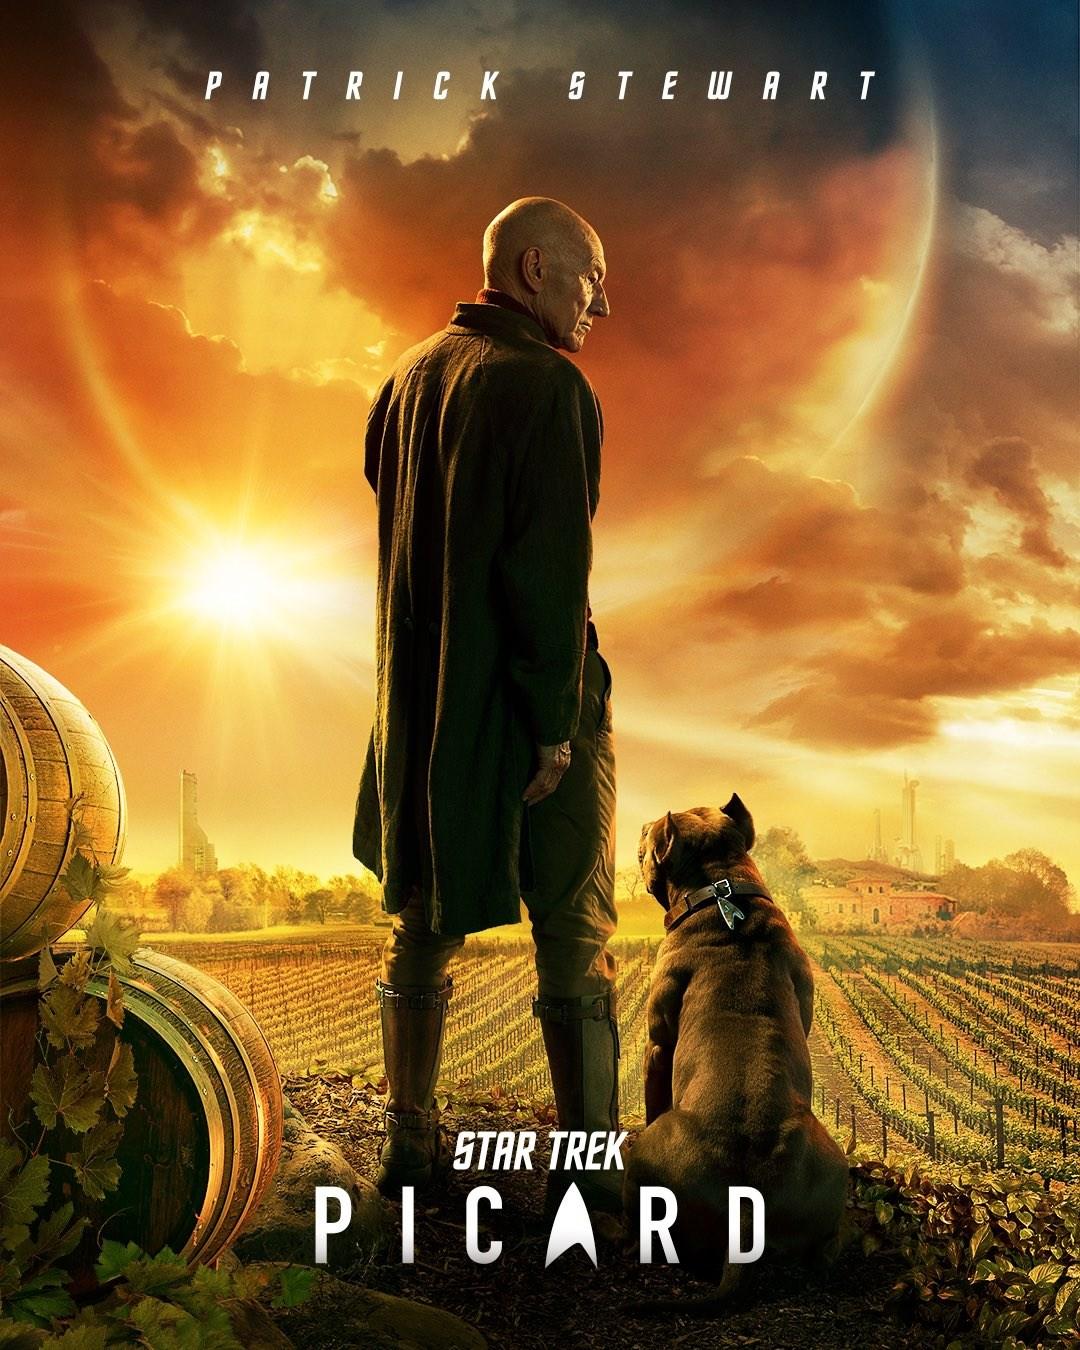 Star-Trek-Picard-Poster-pc-games.jpg